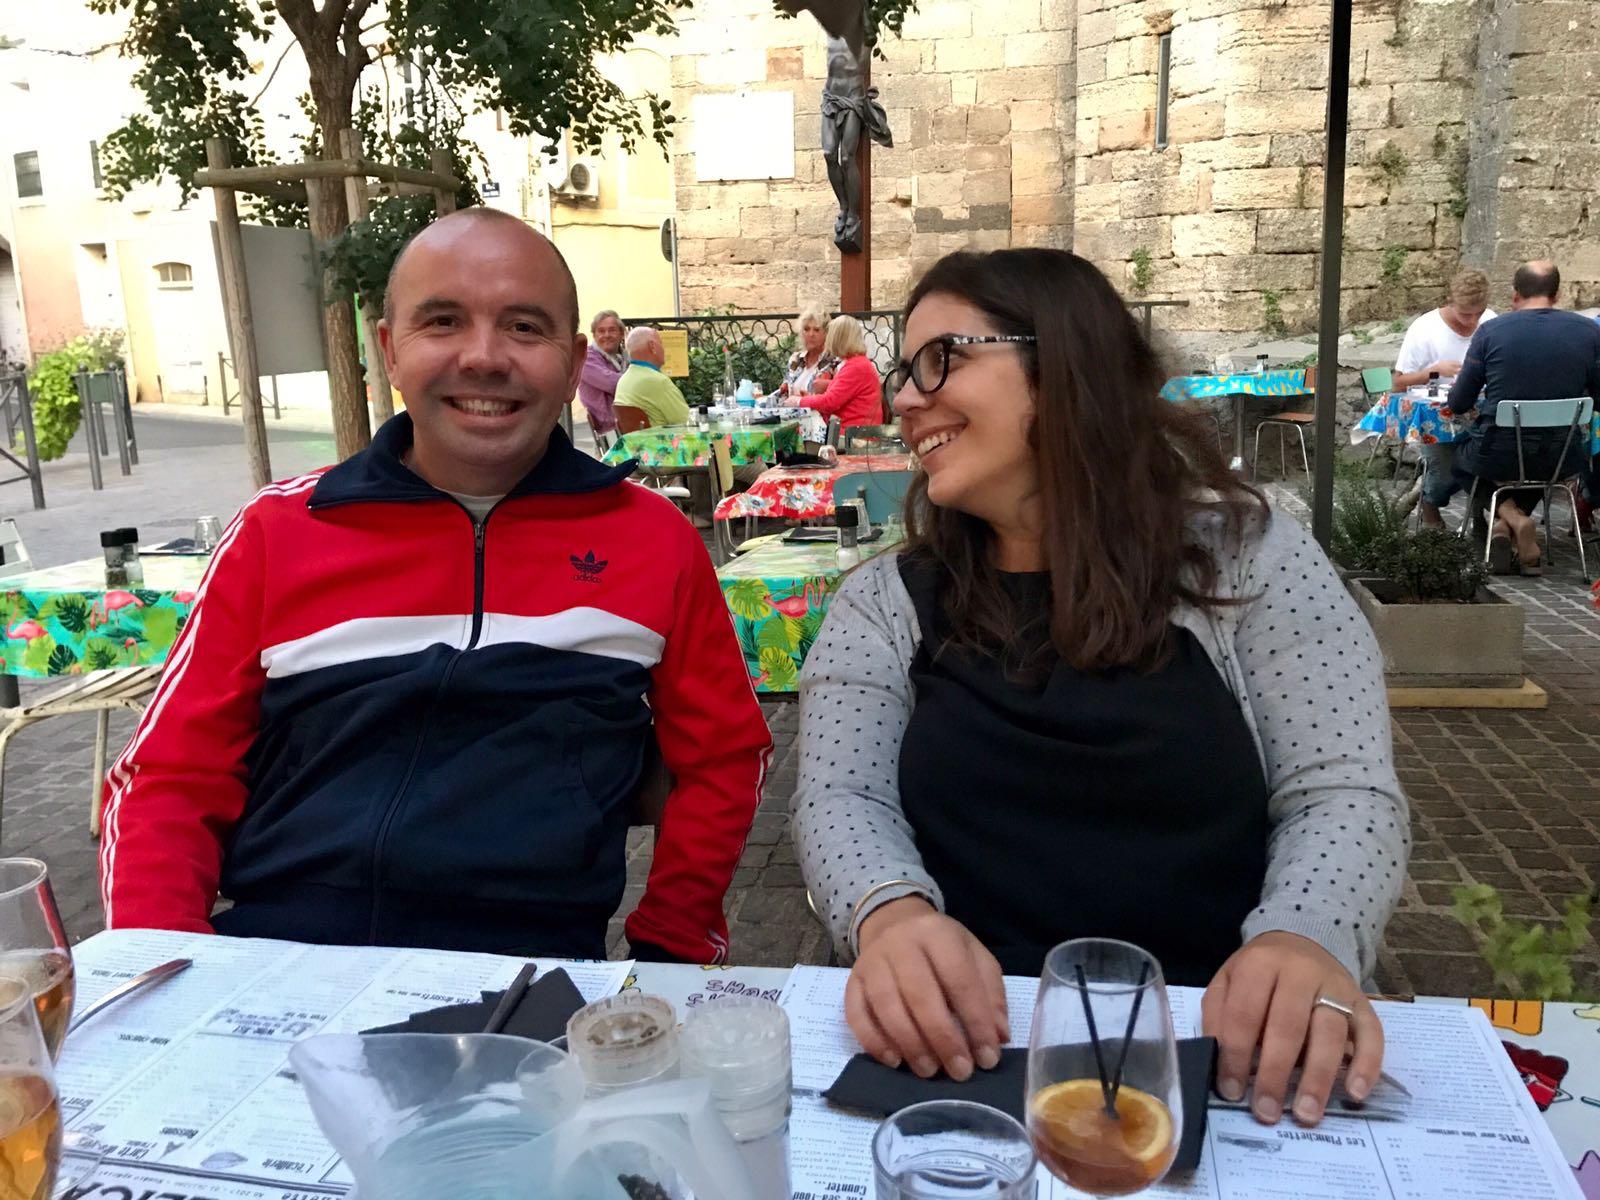 john and fanny at an outdoor restaurant in marseillan